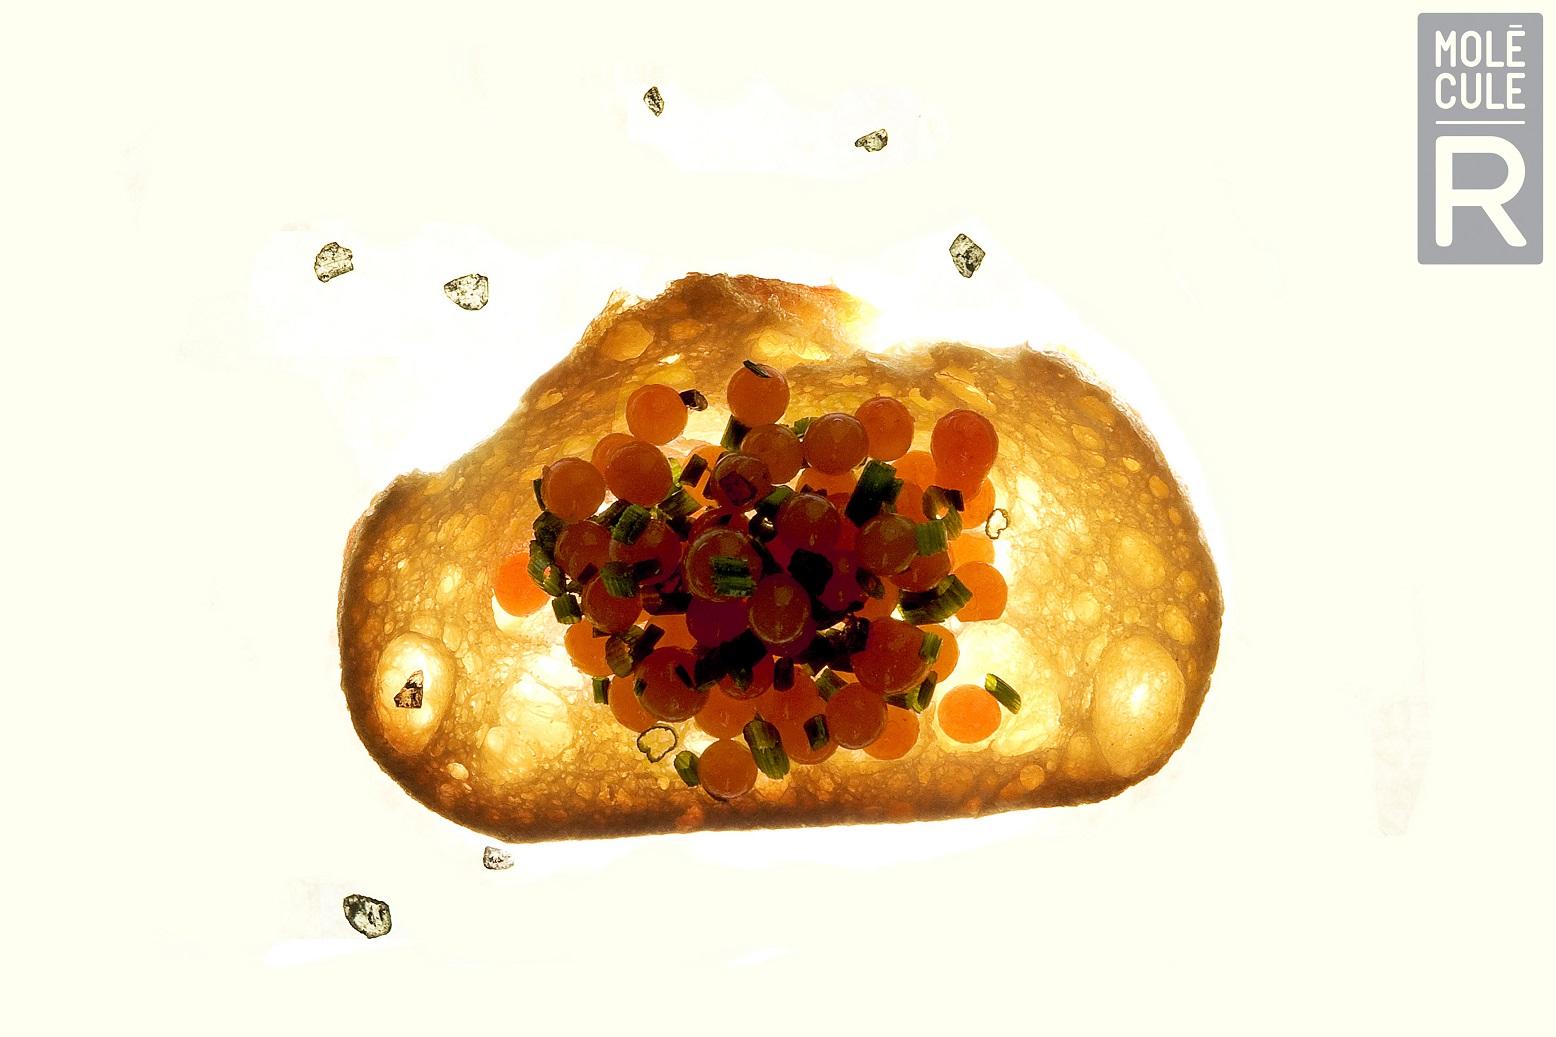 Buy molecule r cuisine r evolution molecular gastronomy kit at free shipping 35 in - Cuisine r evolution recipes ...